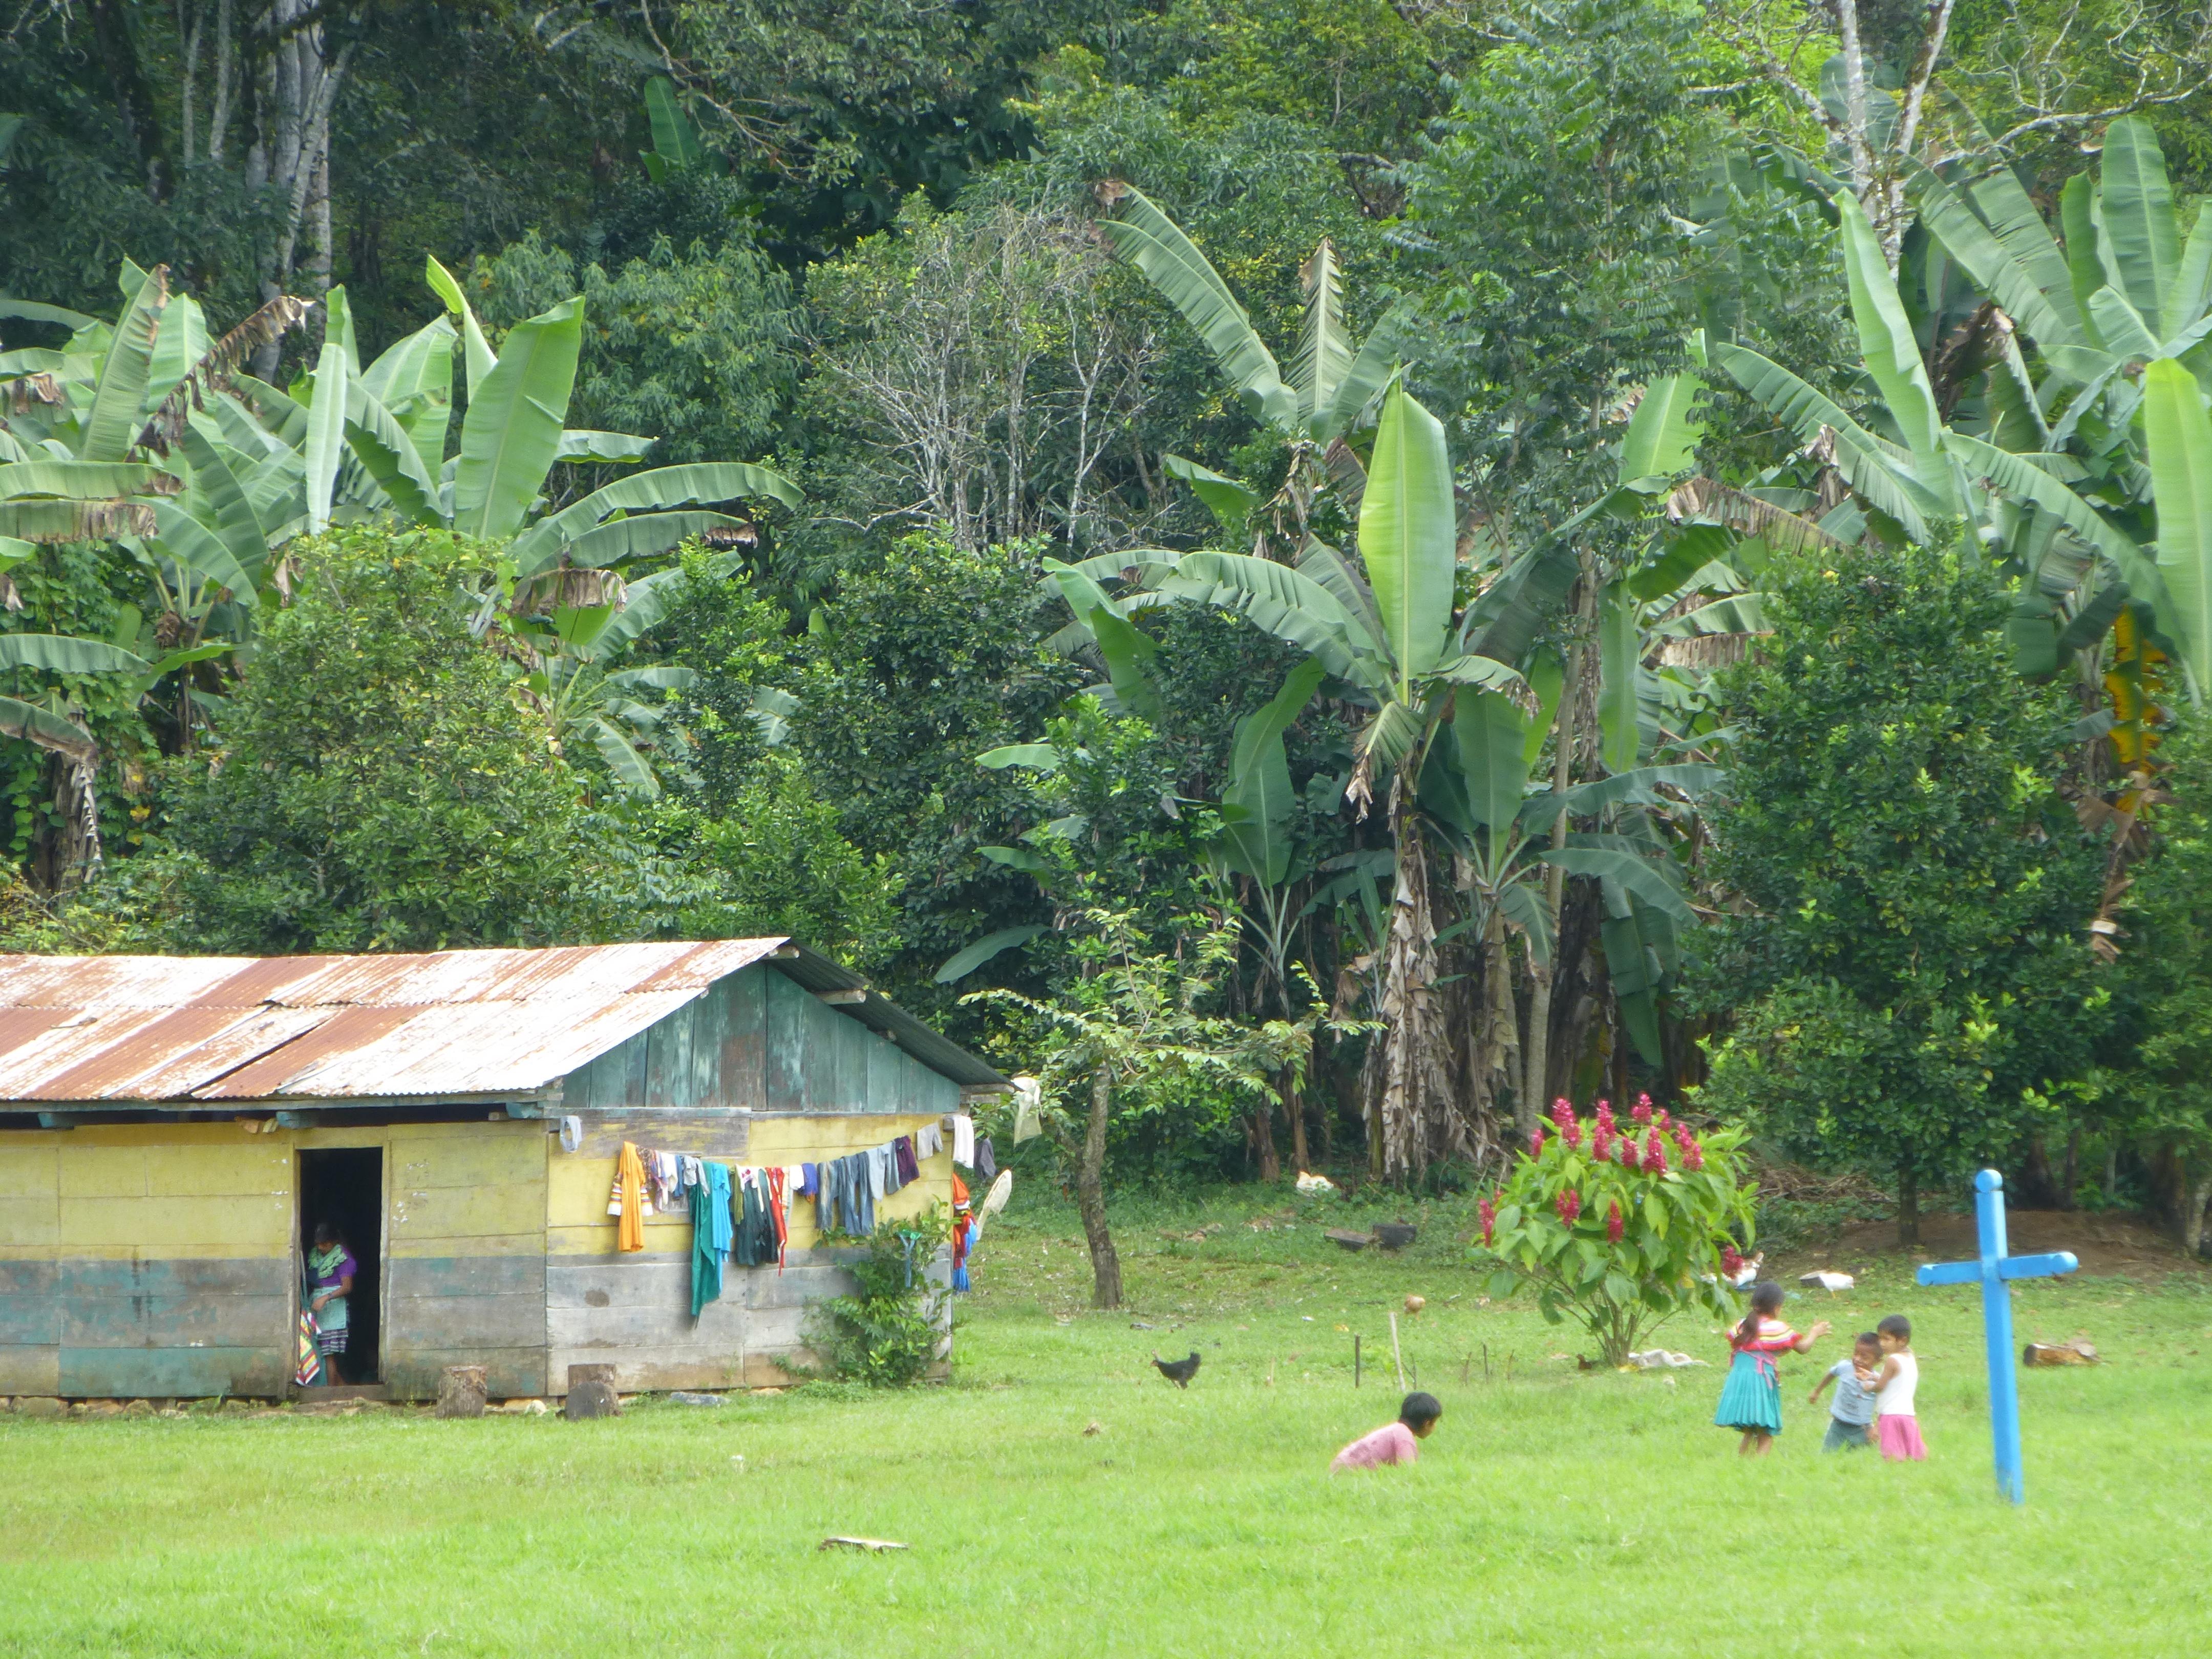 Lacandon Jungle Camping Jungle to 66 Lacandon